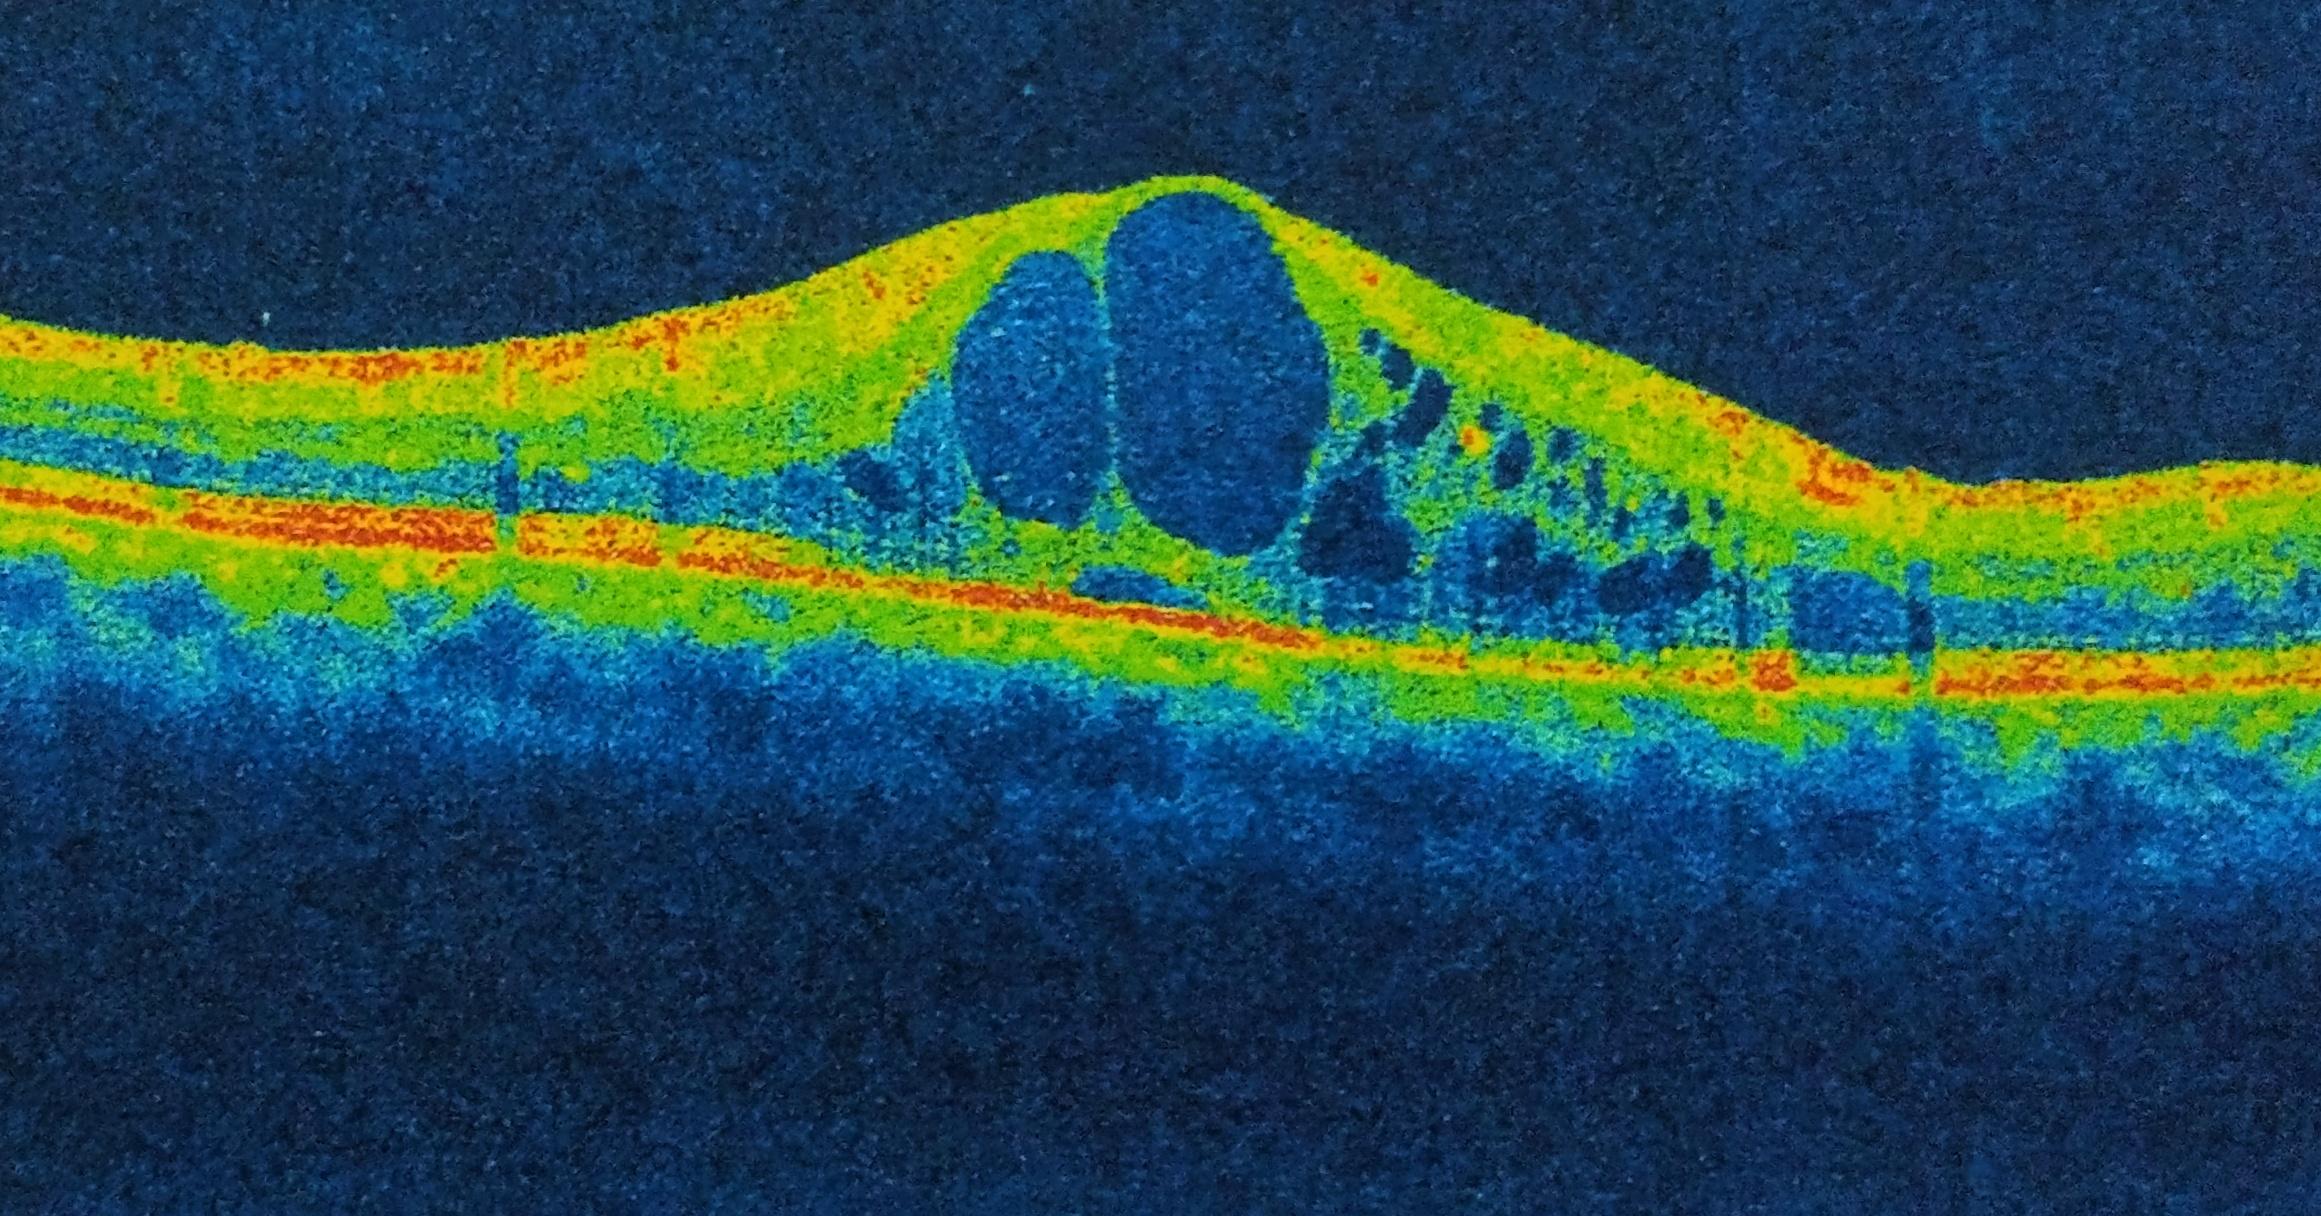 macular oedema oct